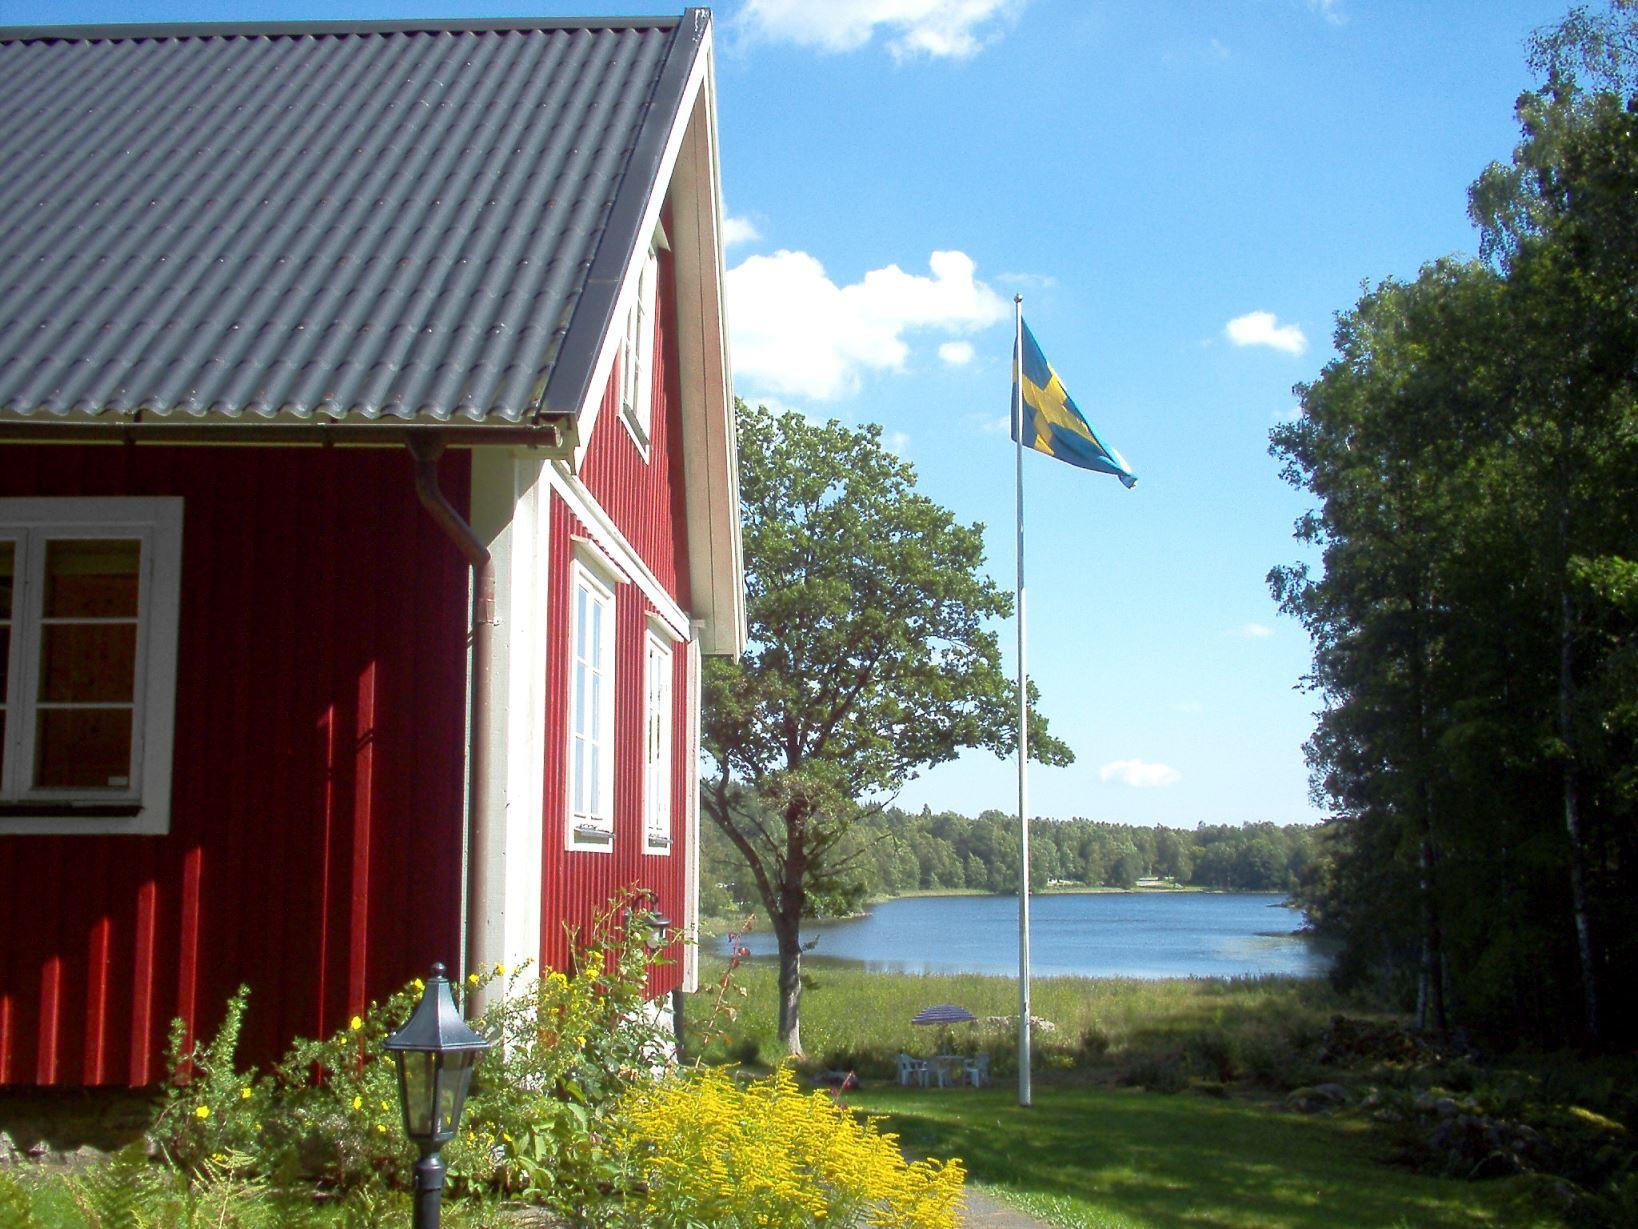 Foto Stugsommar, Holiday houses in Hässleholm!